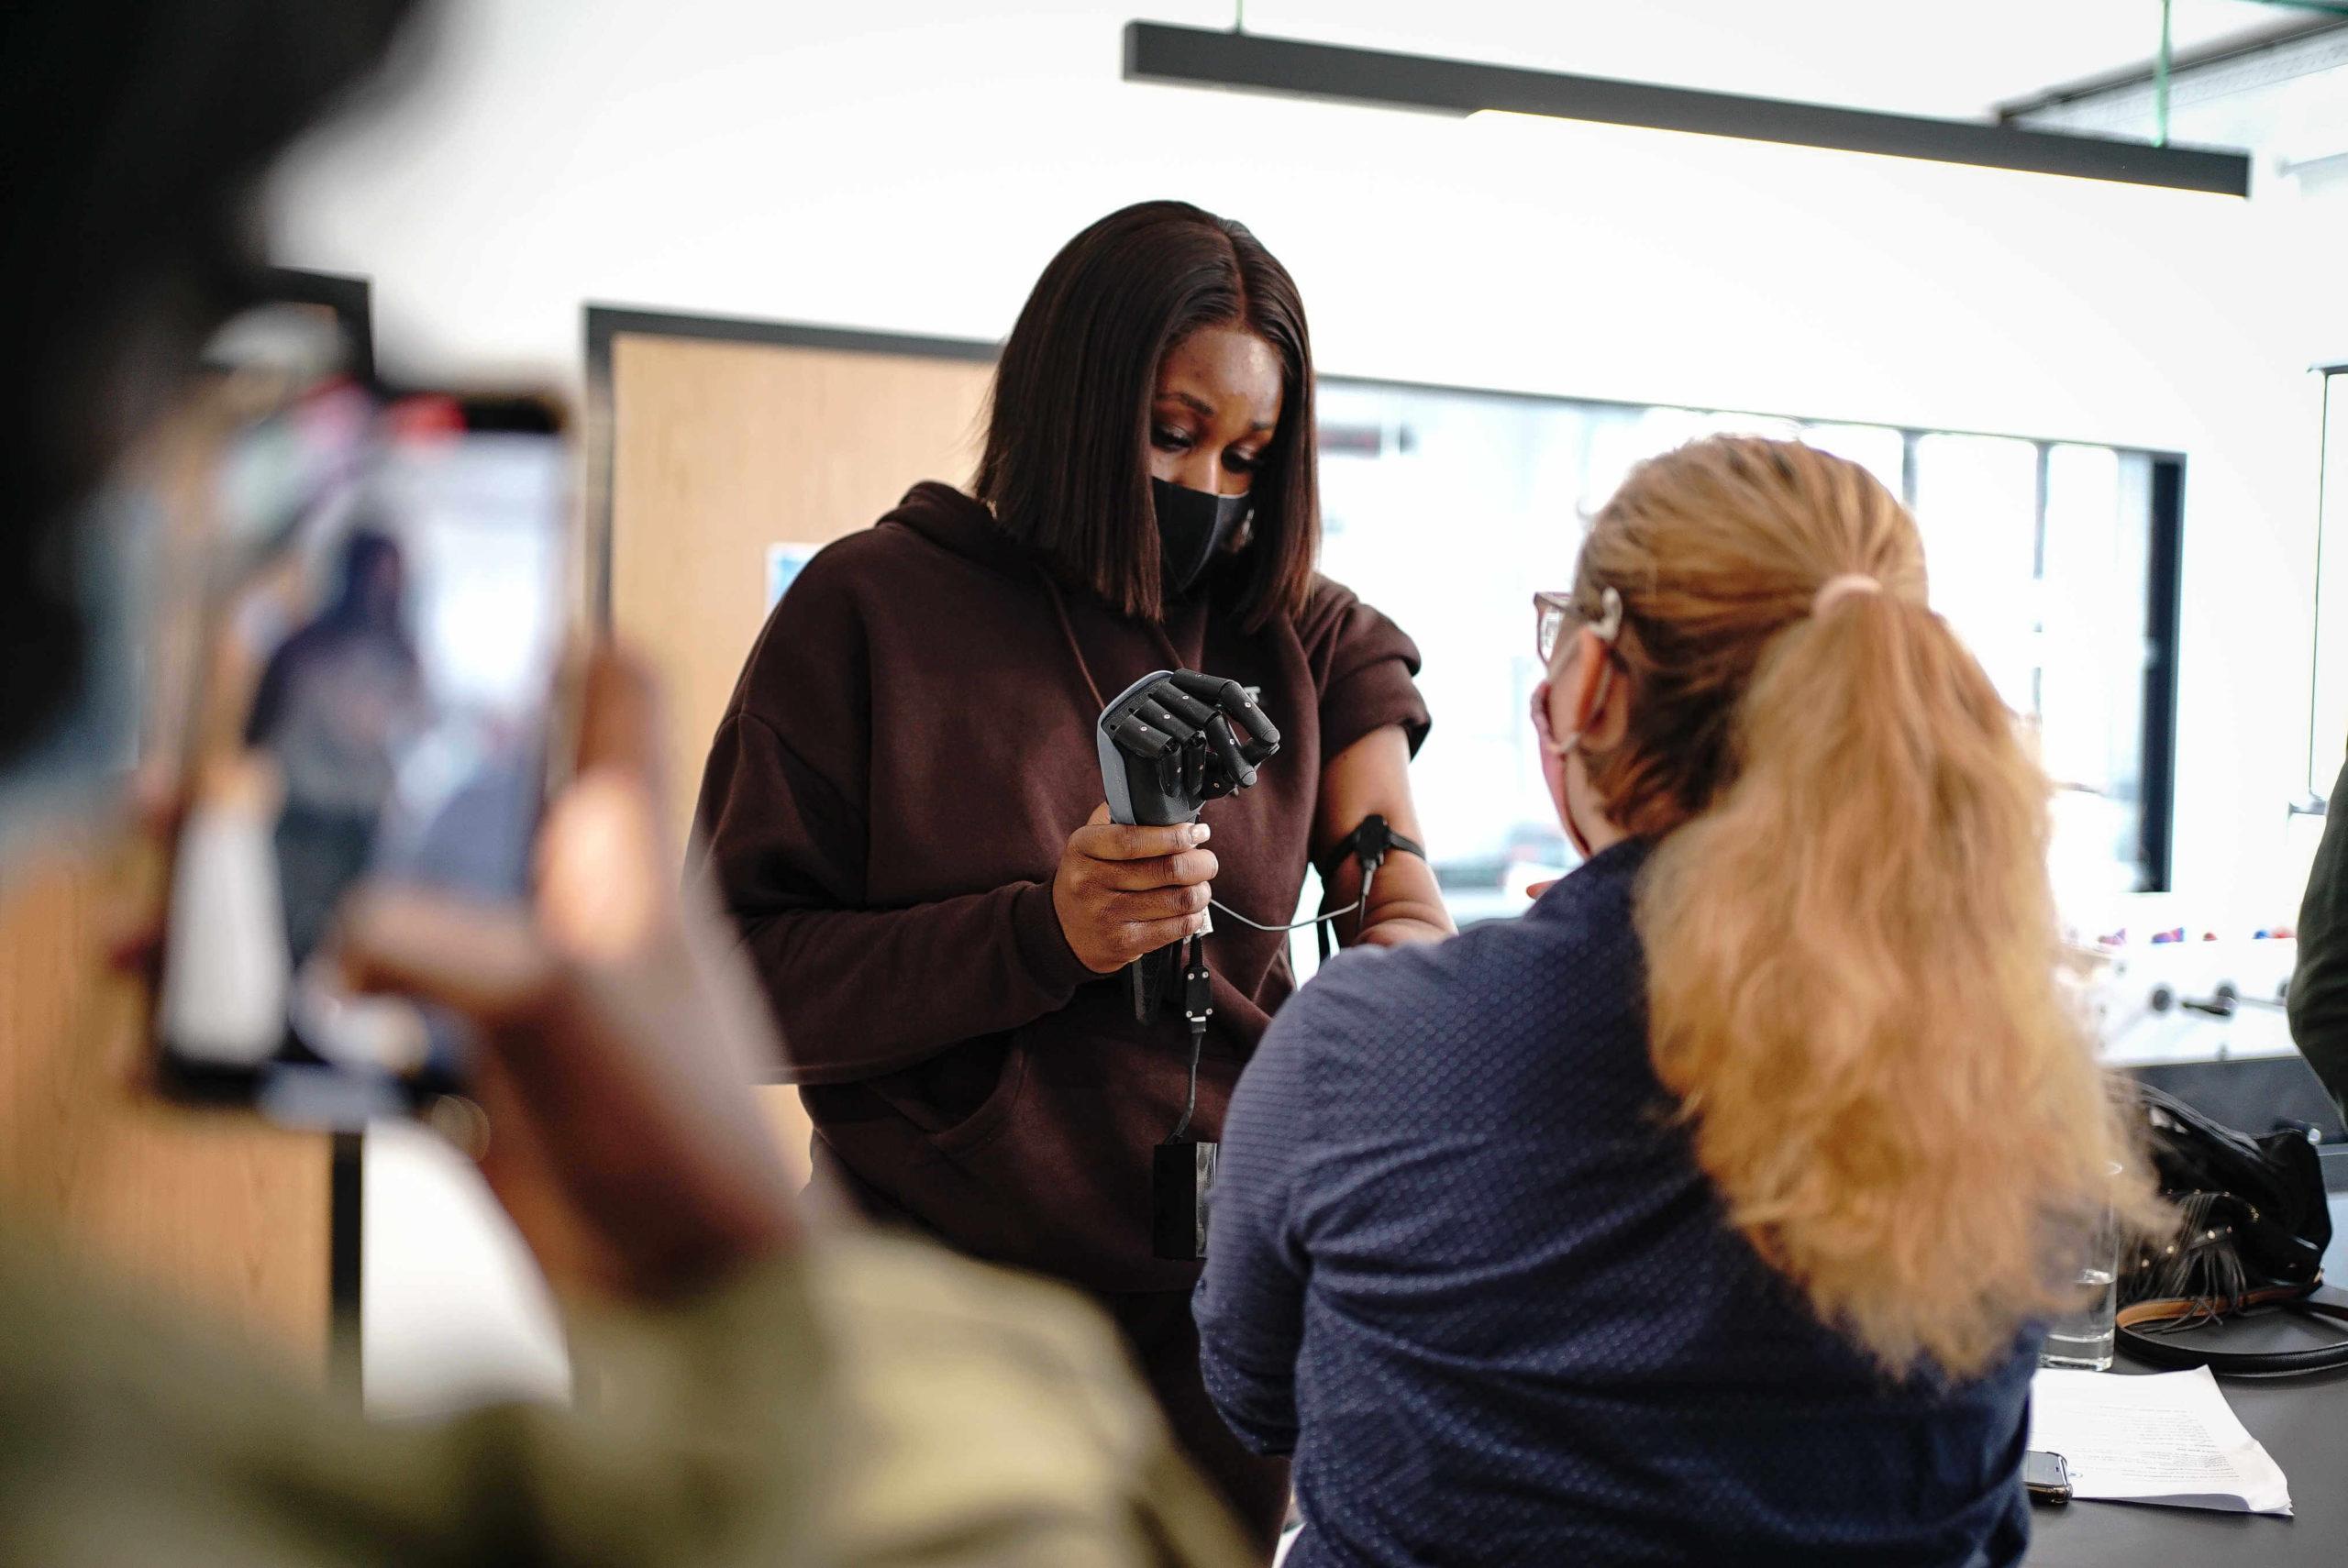 myoelectric prosthetic arm - Hero Arm trial day